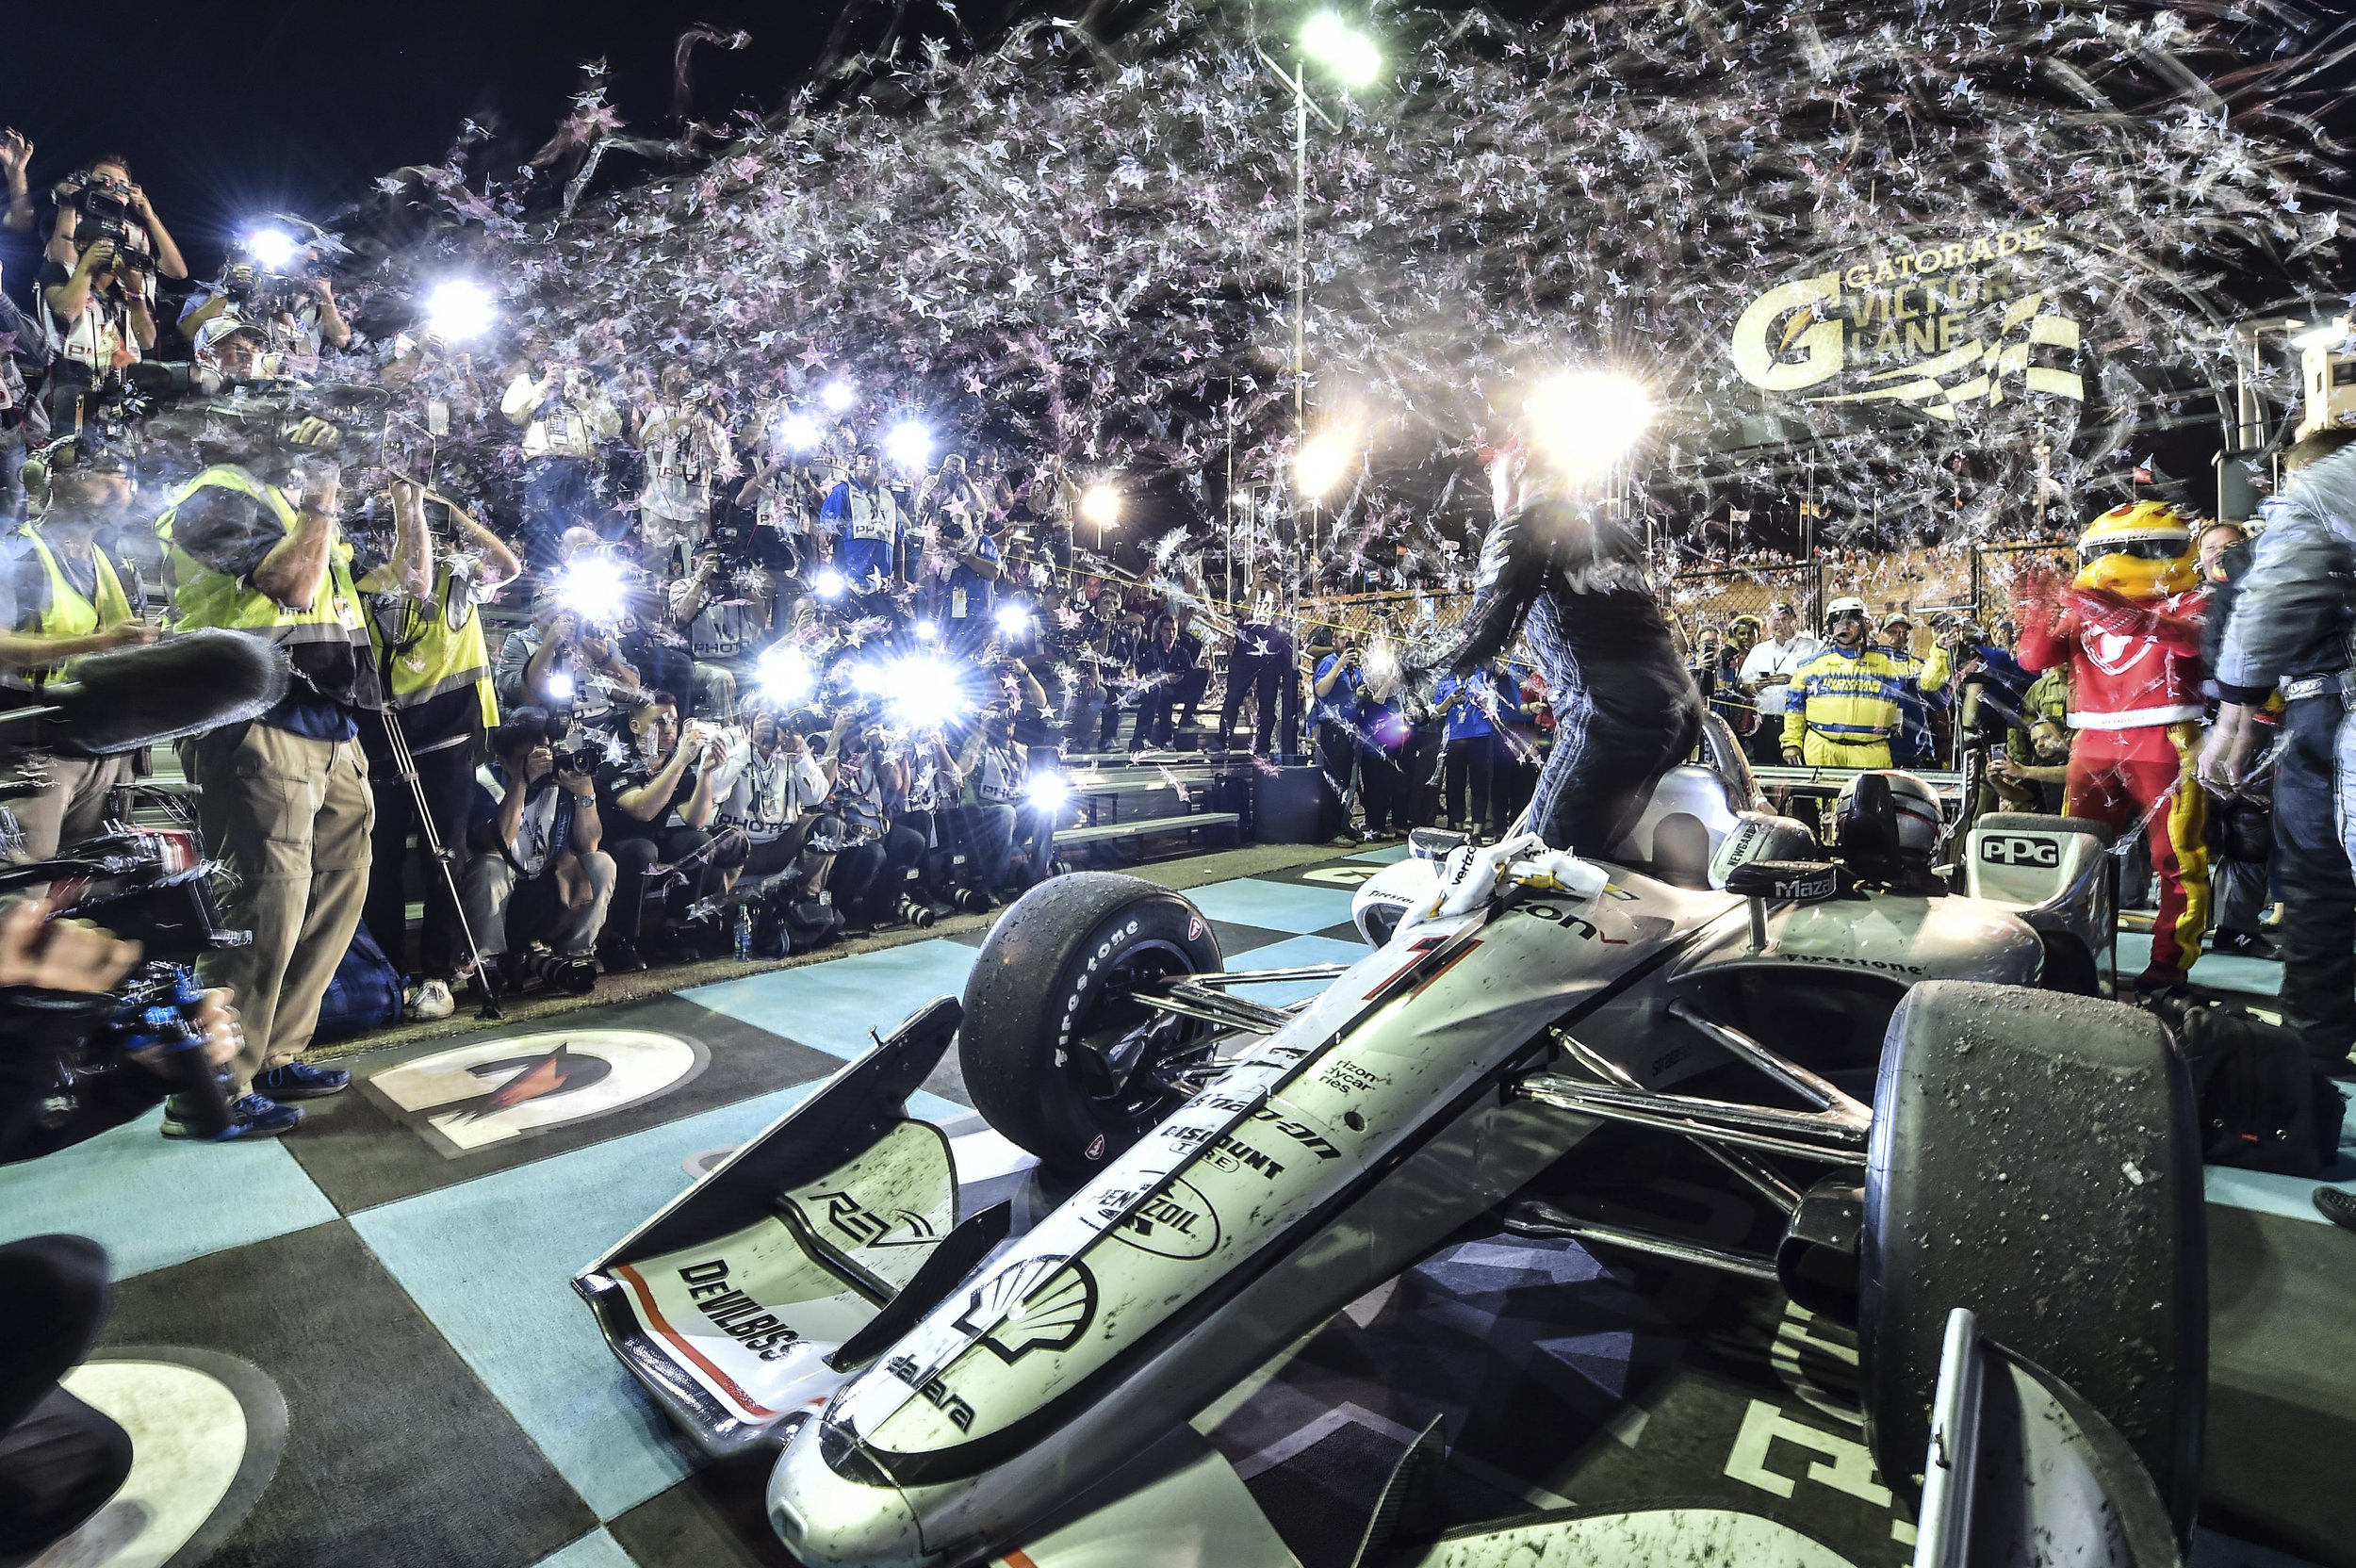 Lights, Camera, Action - Josef Newgarden wins at Phoenix